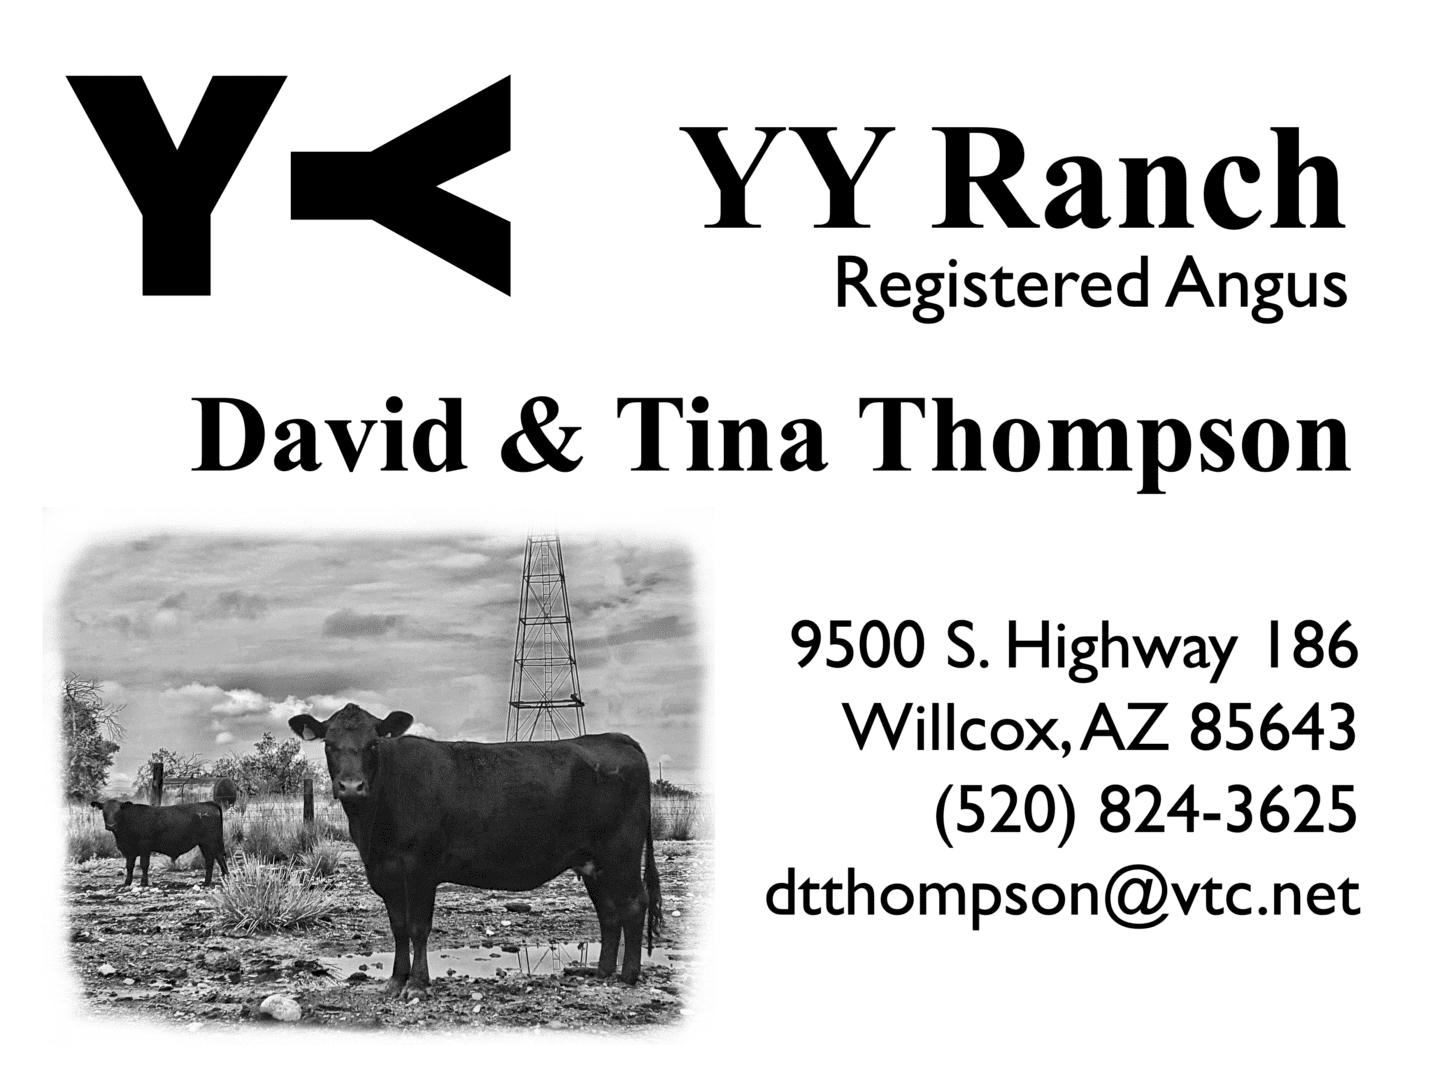 Contact David Thompson @ dtthompson@vtc.net or (520) 824-3625